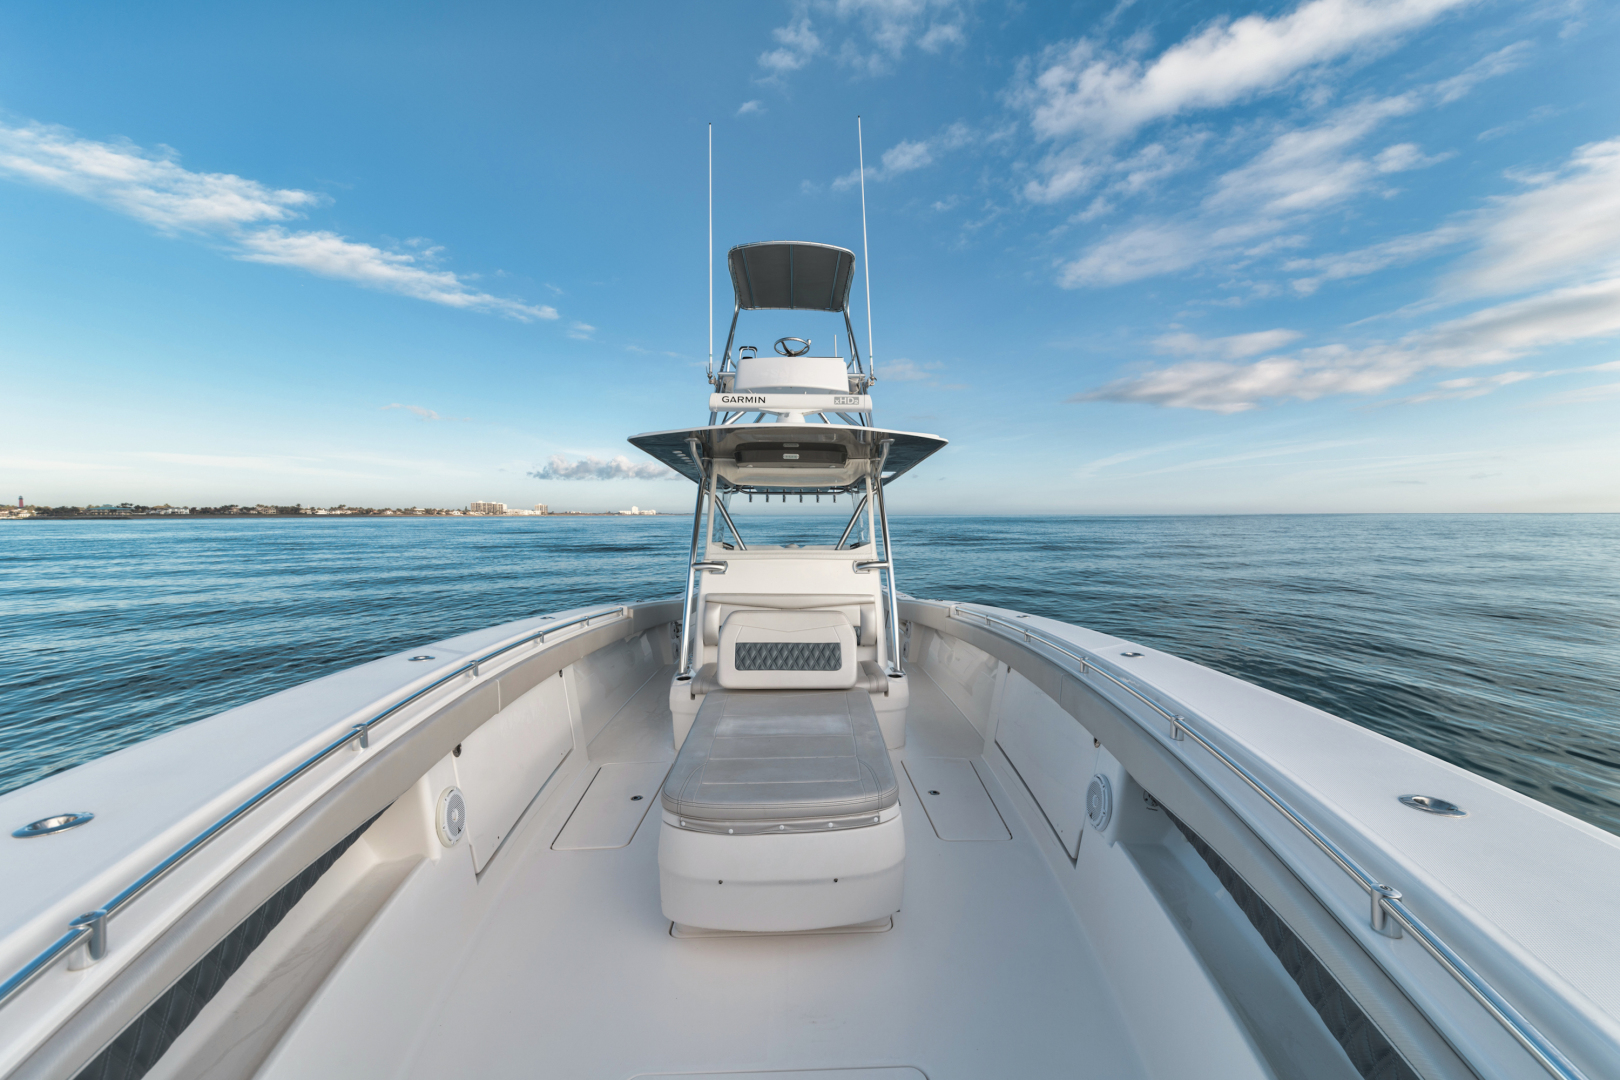 Invincible-Open Fisherman 2017-42 Invincible Jupiter-Florida-United States-1604193   Thumbnail